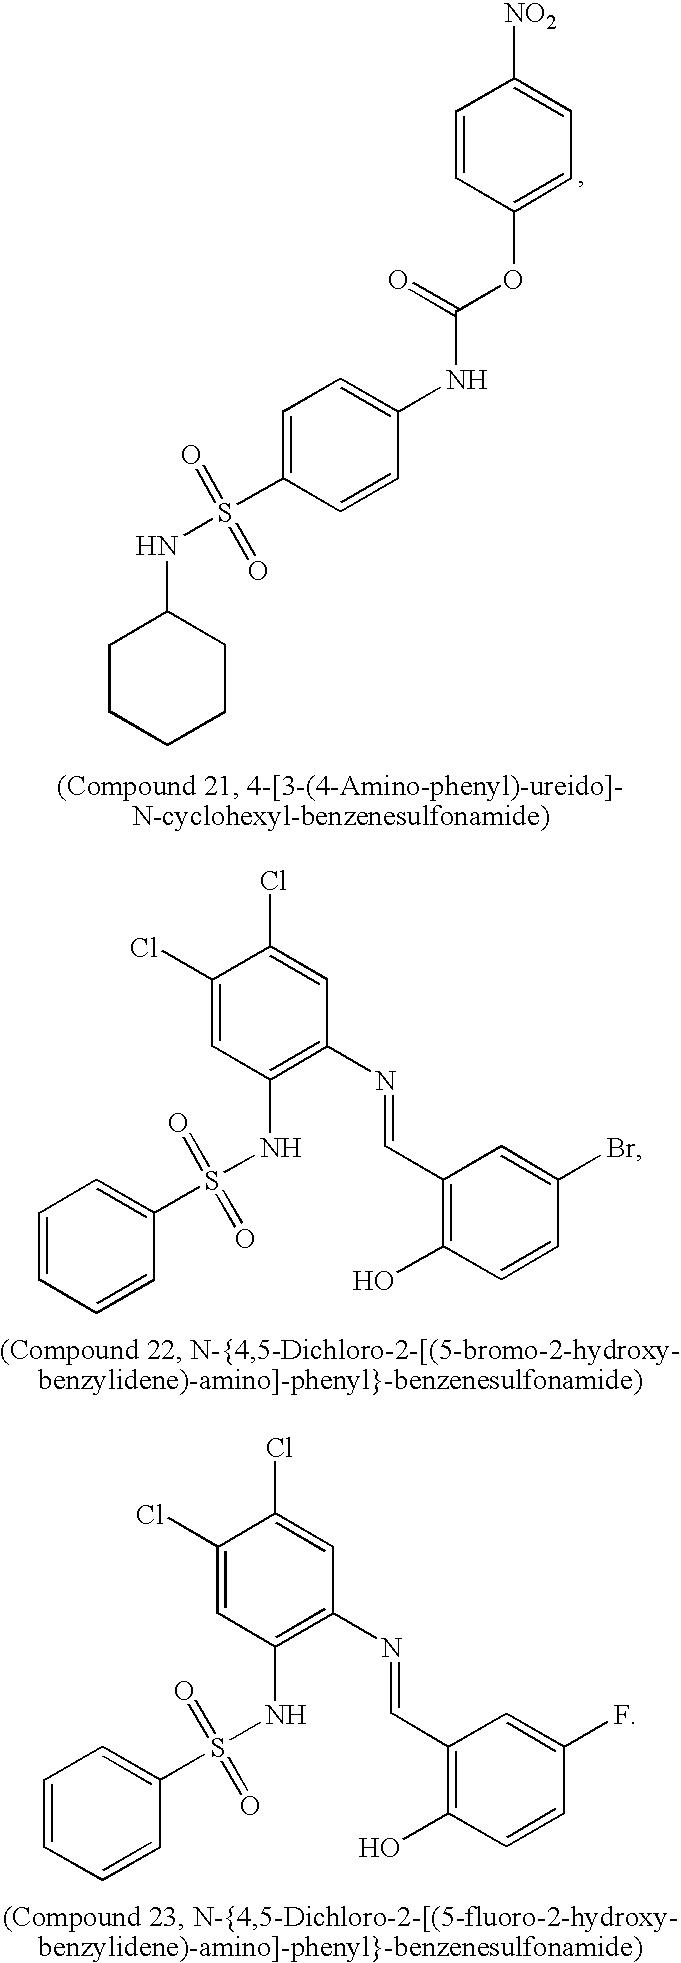 US20100035940A1 - Cyclin Dependent Kinase Inhibitors